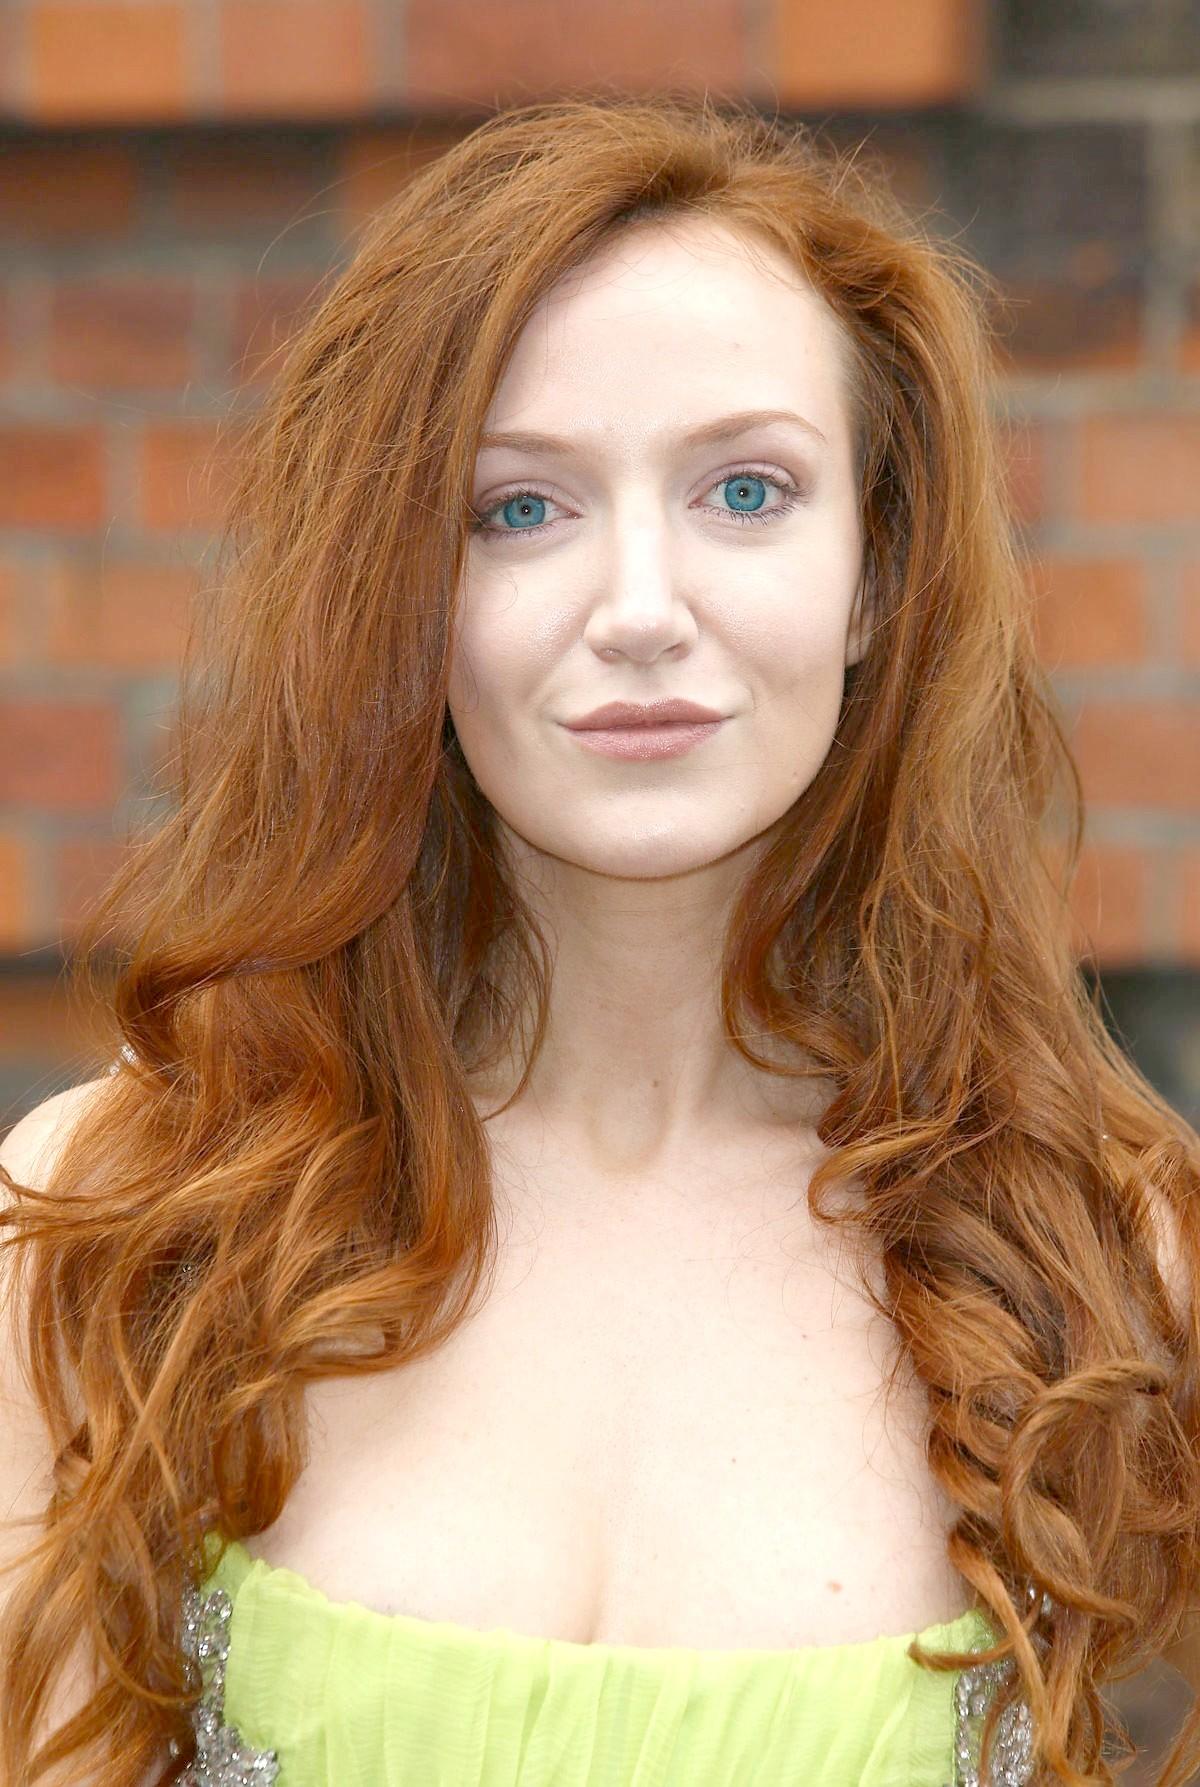 Olivia Grant